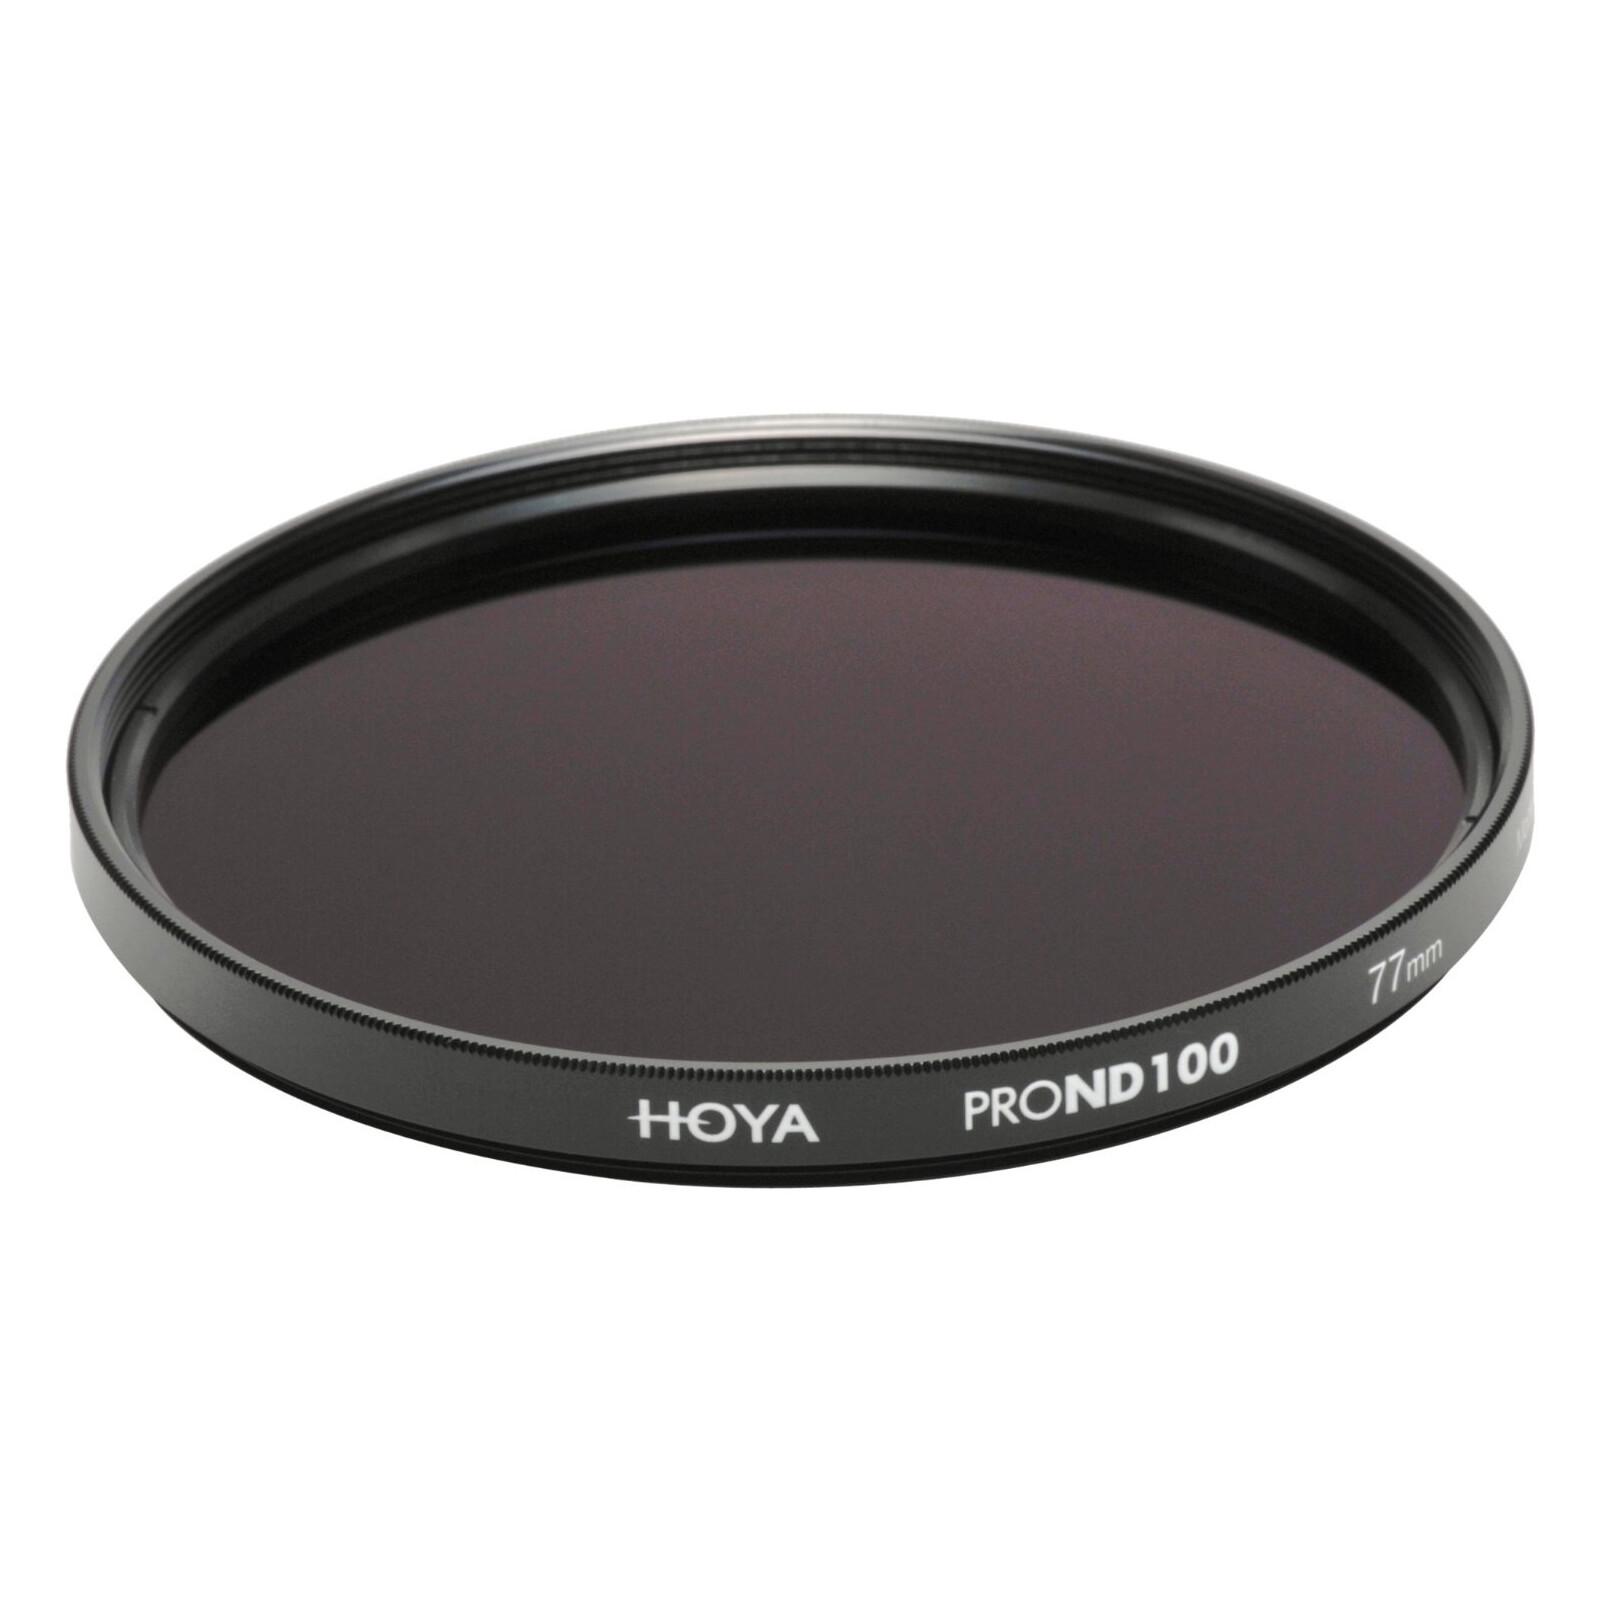 Hoya Grau PRO ND 100 52mm